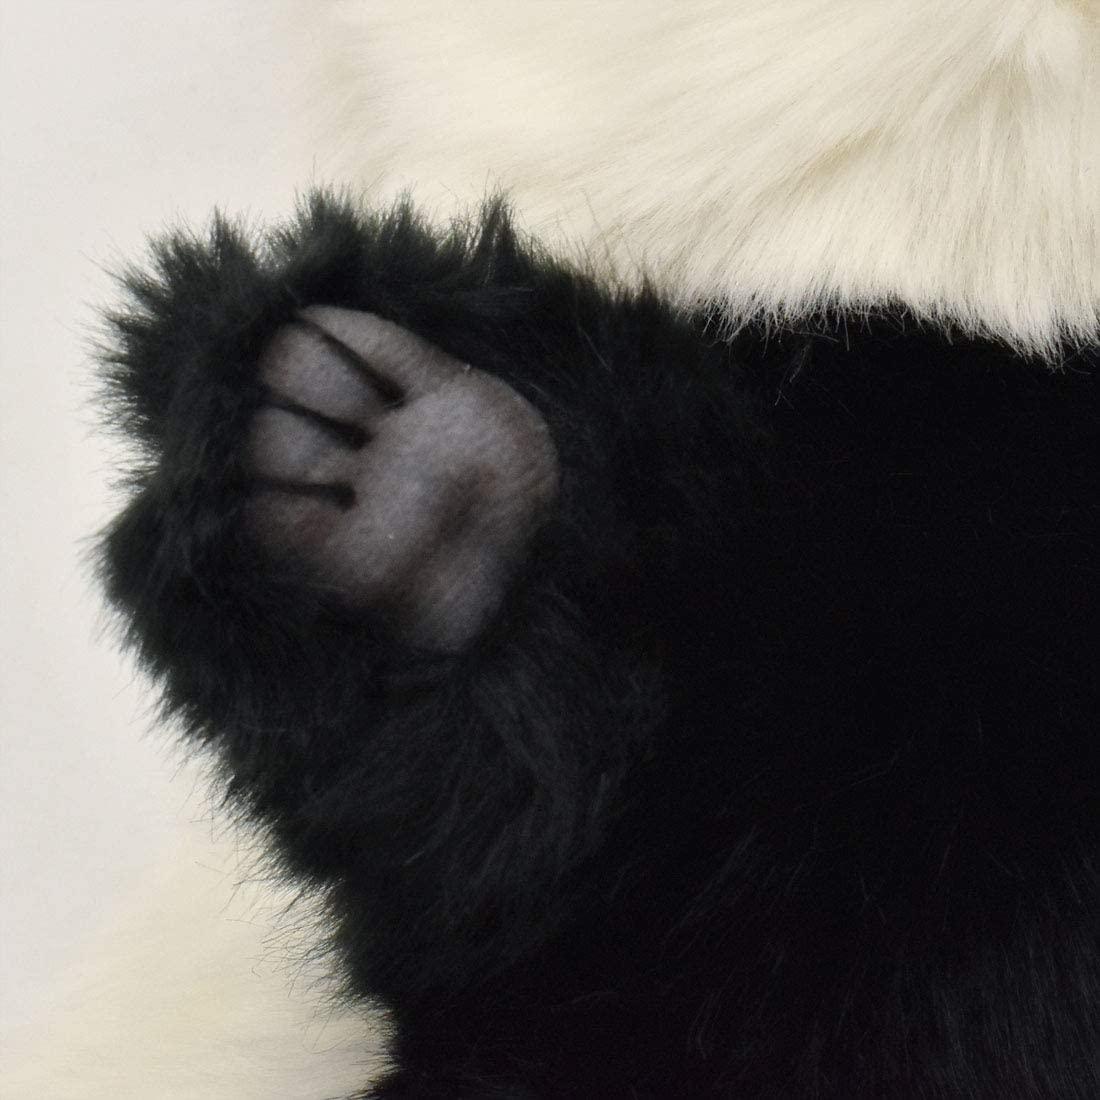 Handpuppe Panda originalgetreu 30cm PandabärTheaterpuppe Hansa 7165 Pfote im Detail